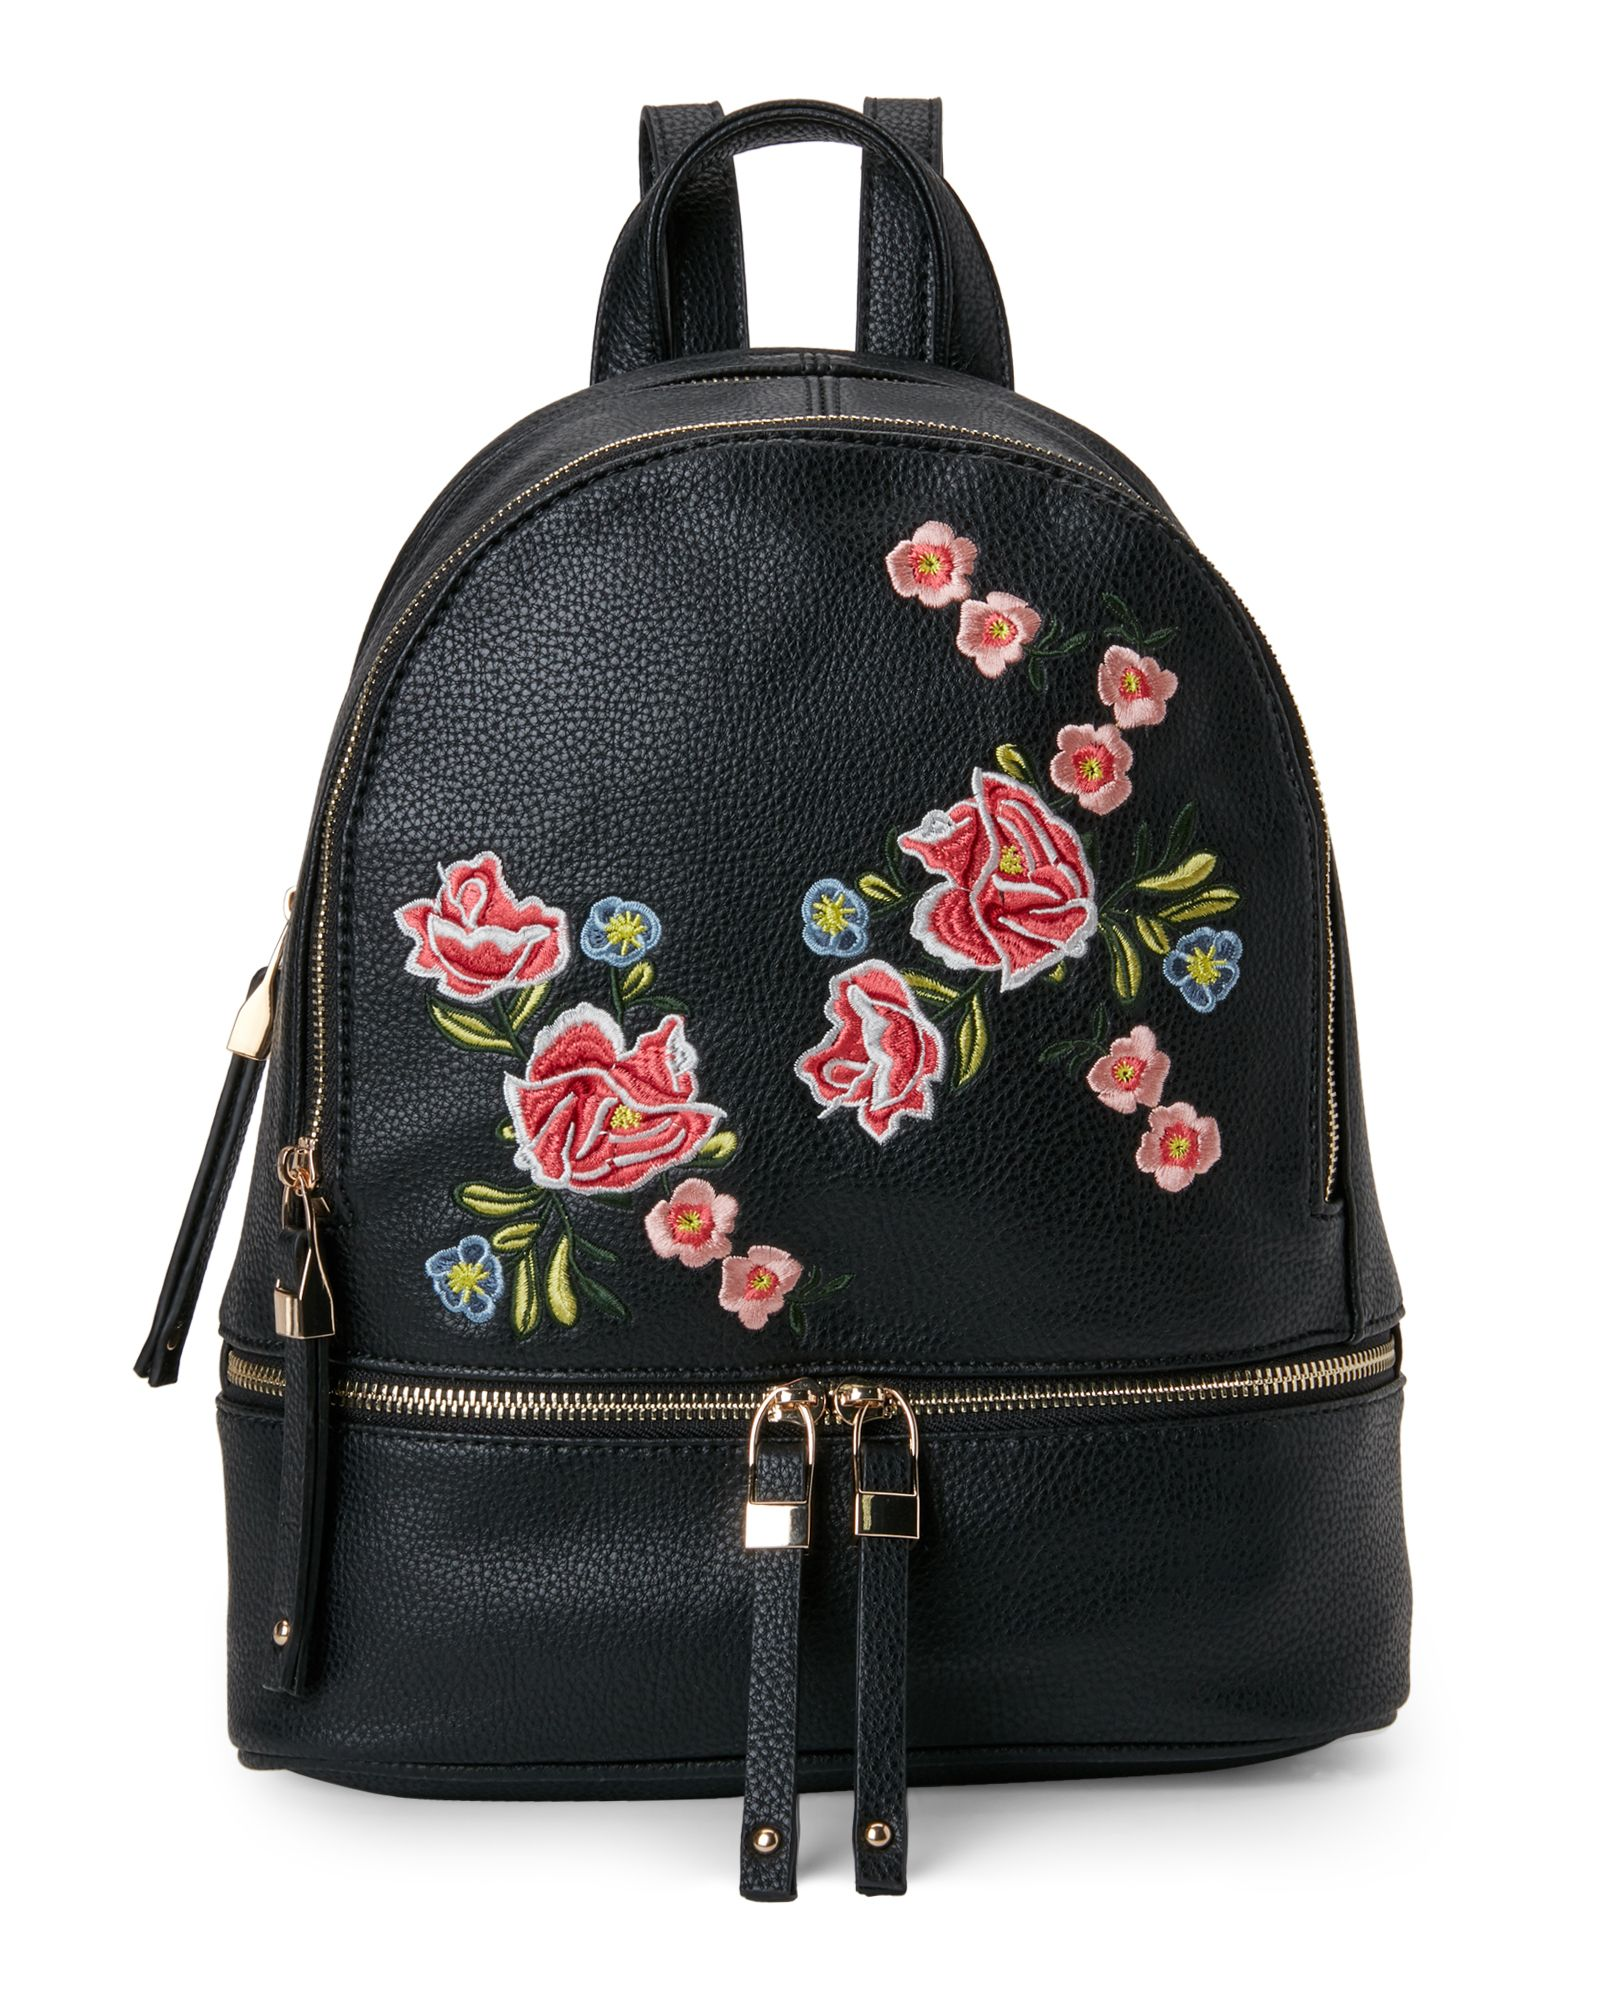 2547dfdacb78 Brooke Rose Embroidered Backpack